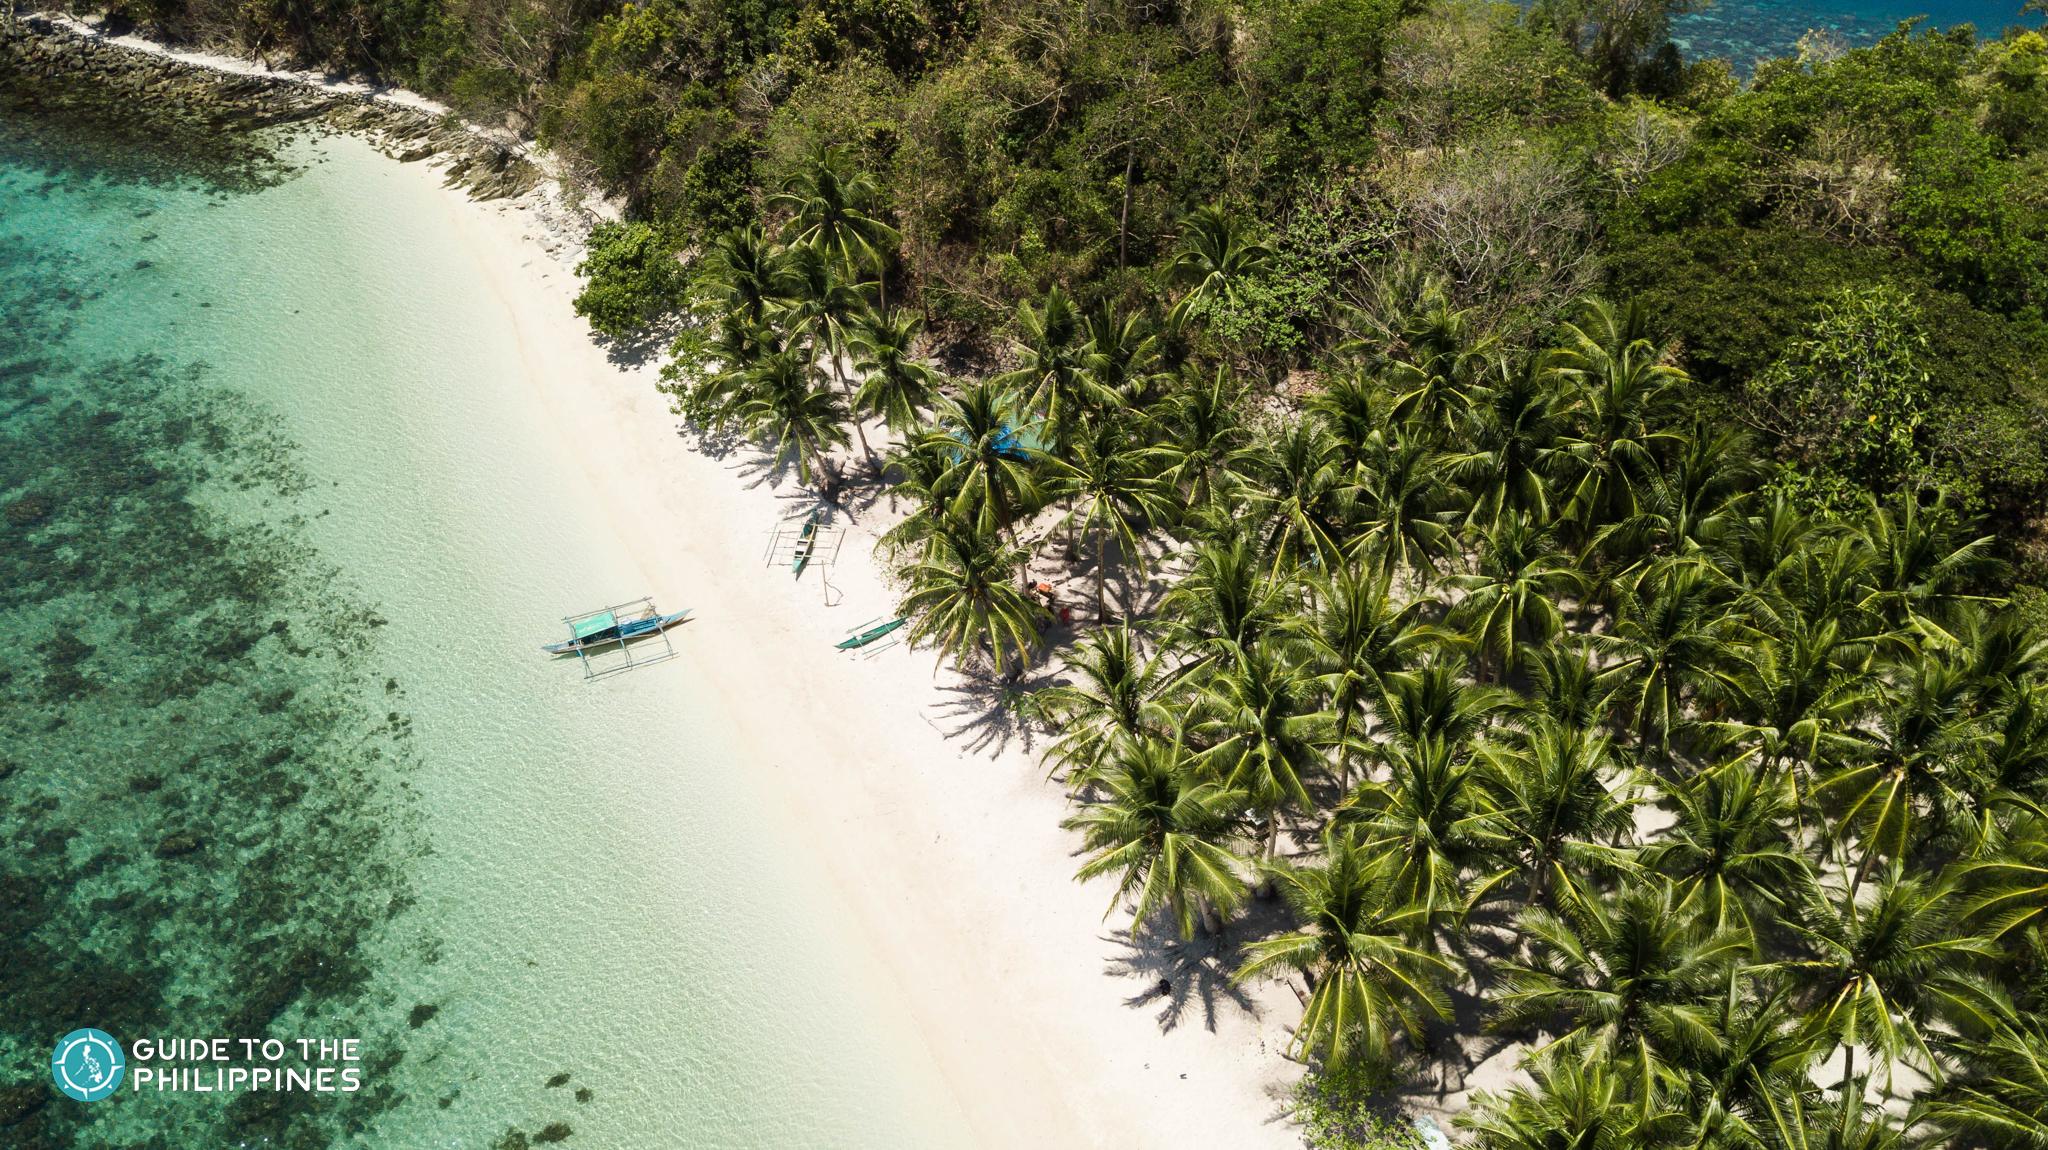 14 Best Port Barton Palawan Hotels and Resorts: Beachfront, Budget-Friendly, Islands